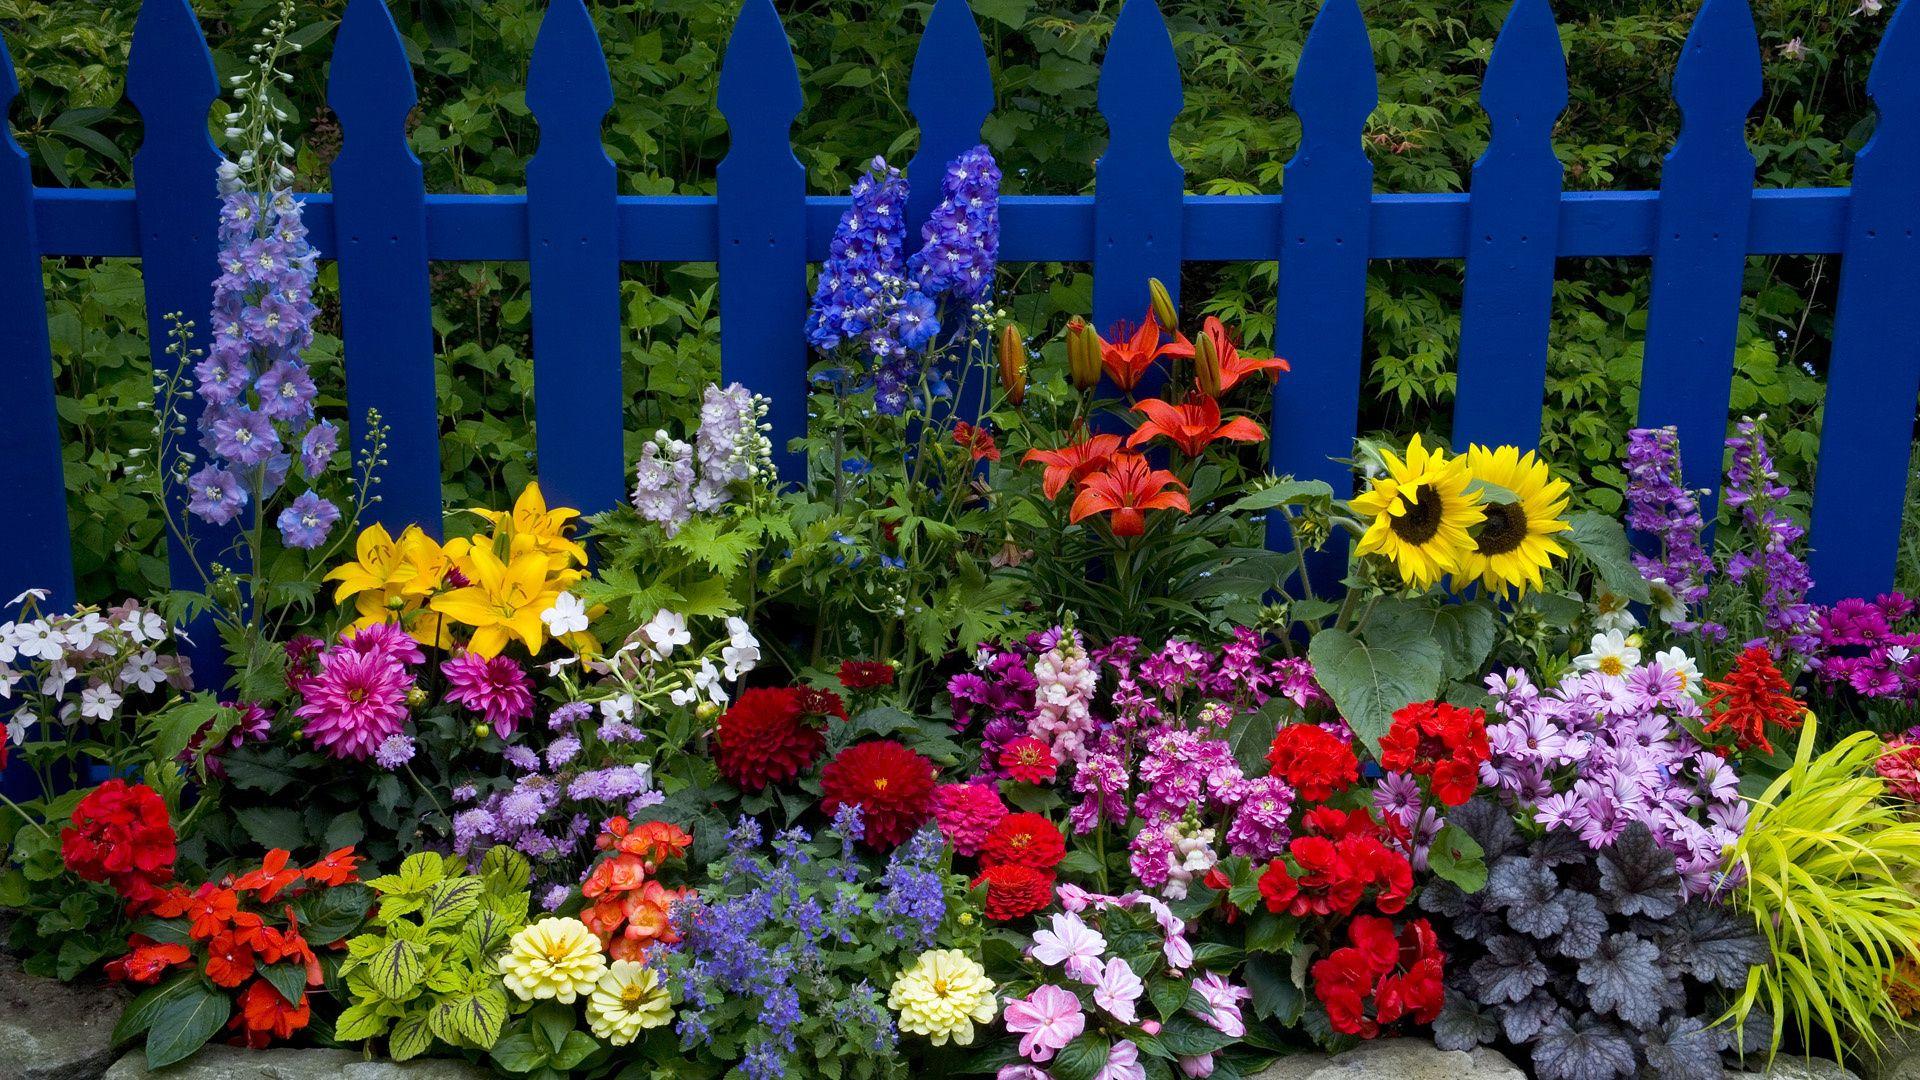 Fond d'écran hd : jardin fleurs  Fond d'écran hd gratuit ...